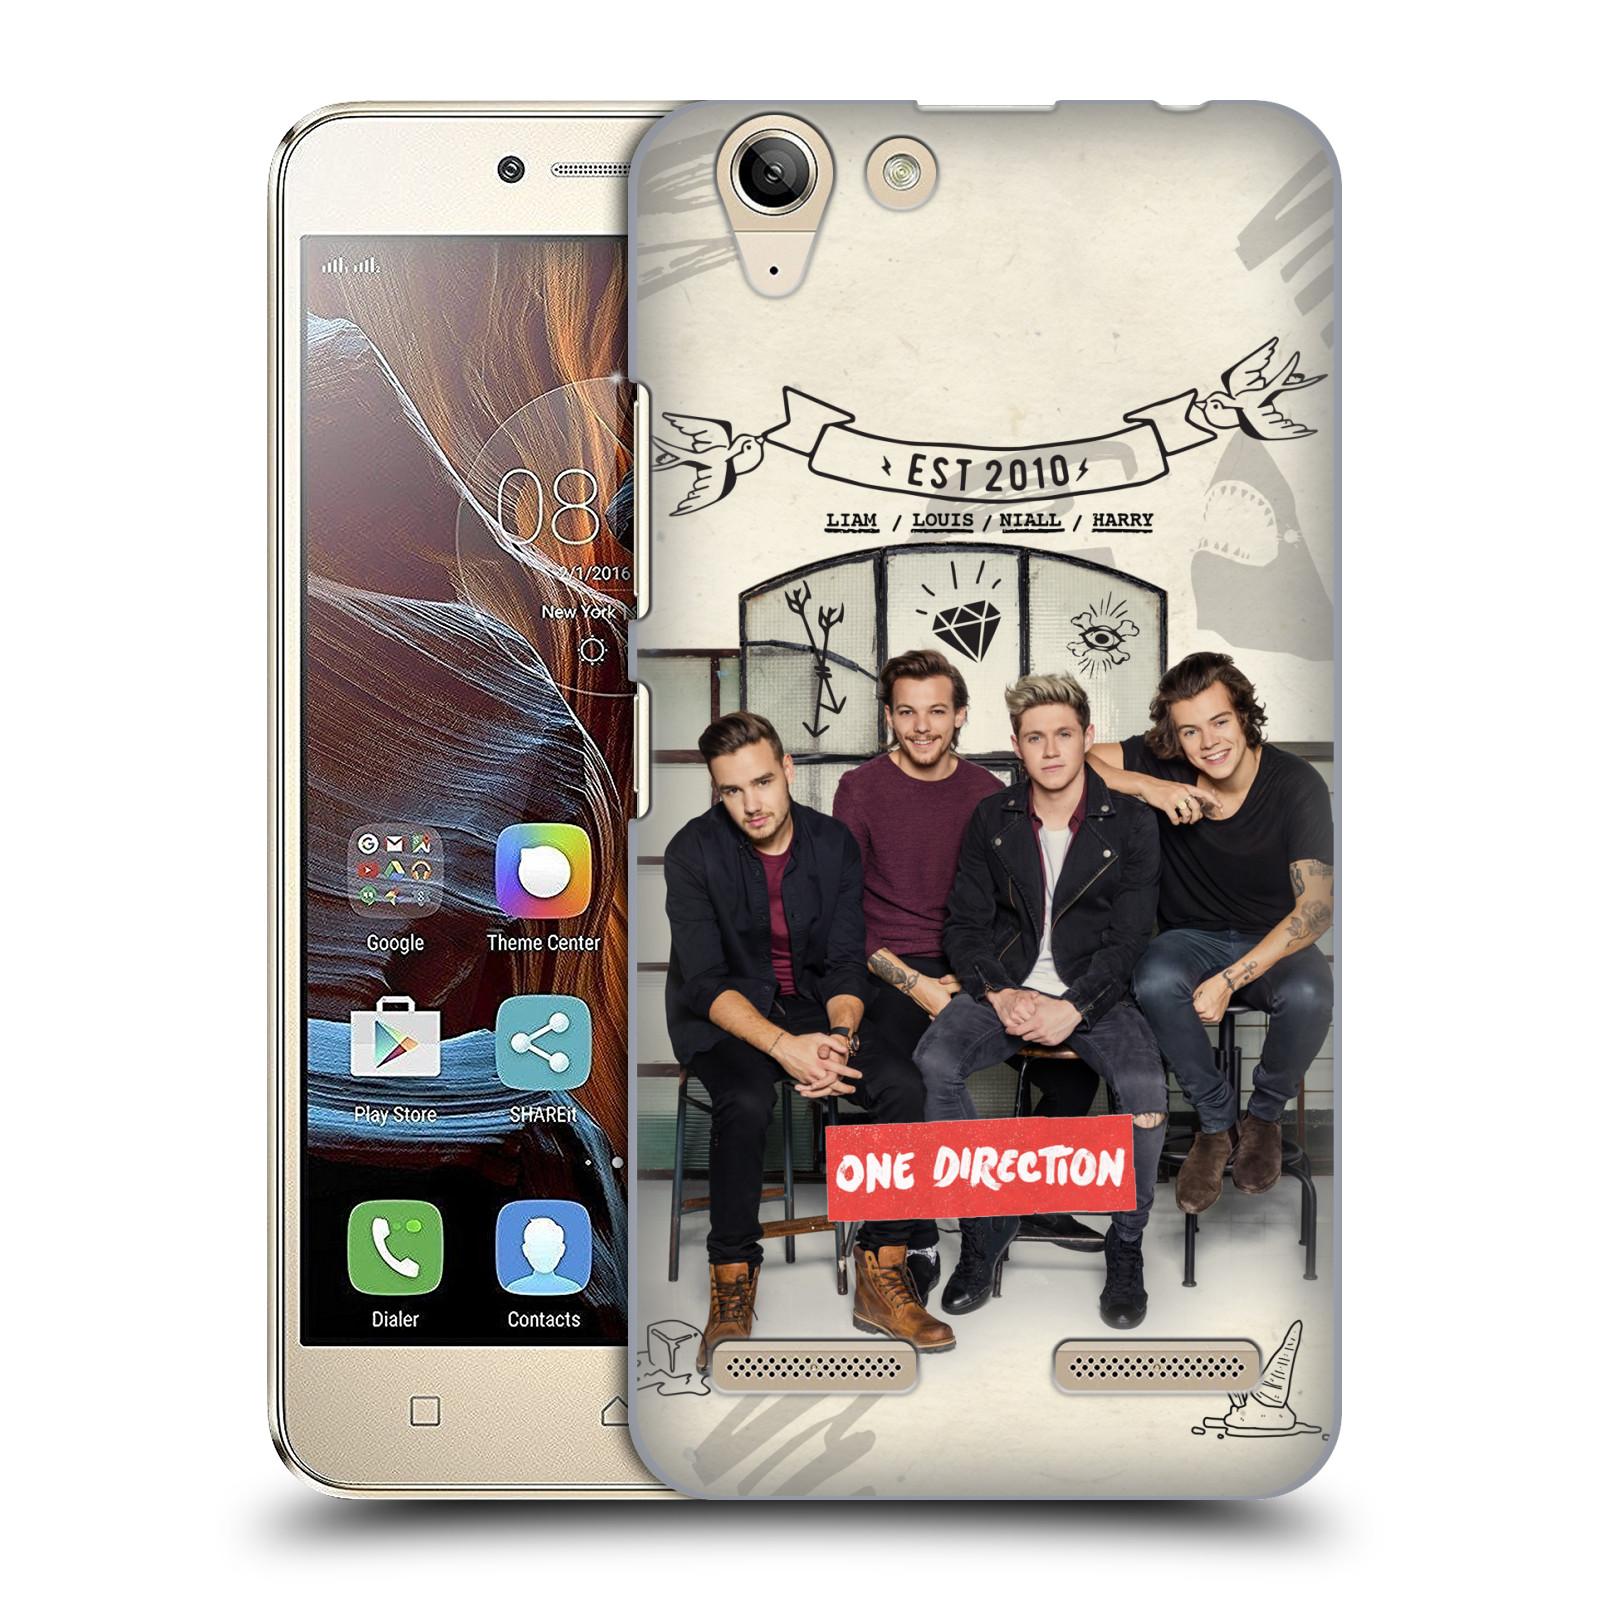 Plastové pouzdro na mobil Lenovo K5 / K5 Plus HEAD CASE One Direction - EST 2010 (Plastový kryt či obal One Direction Official na mobilní telefon Lenovo K5 / K5 Plus)